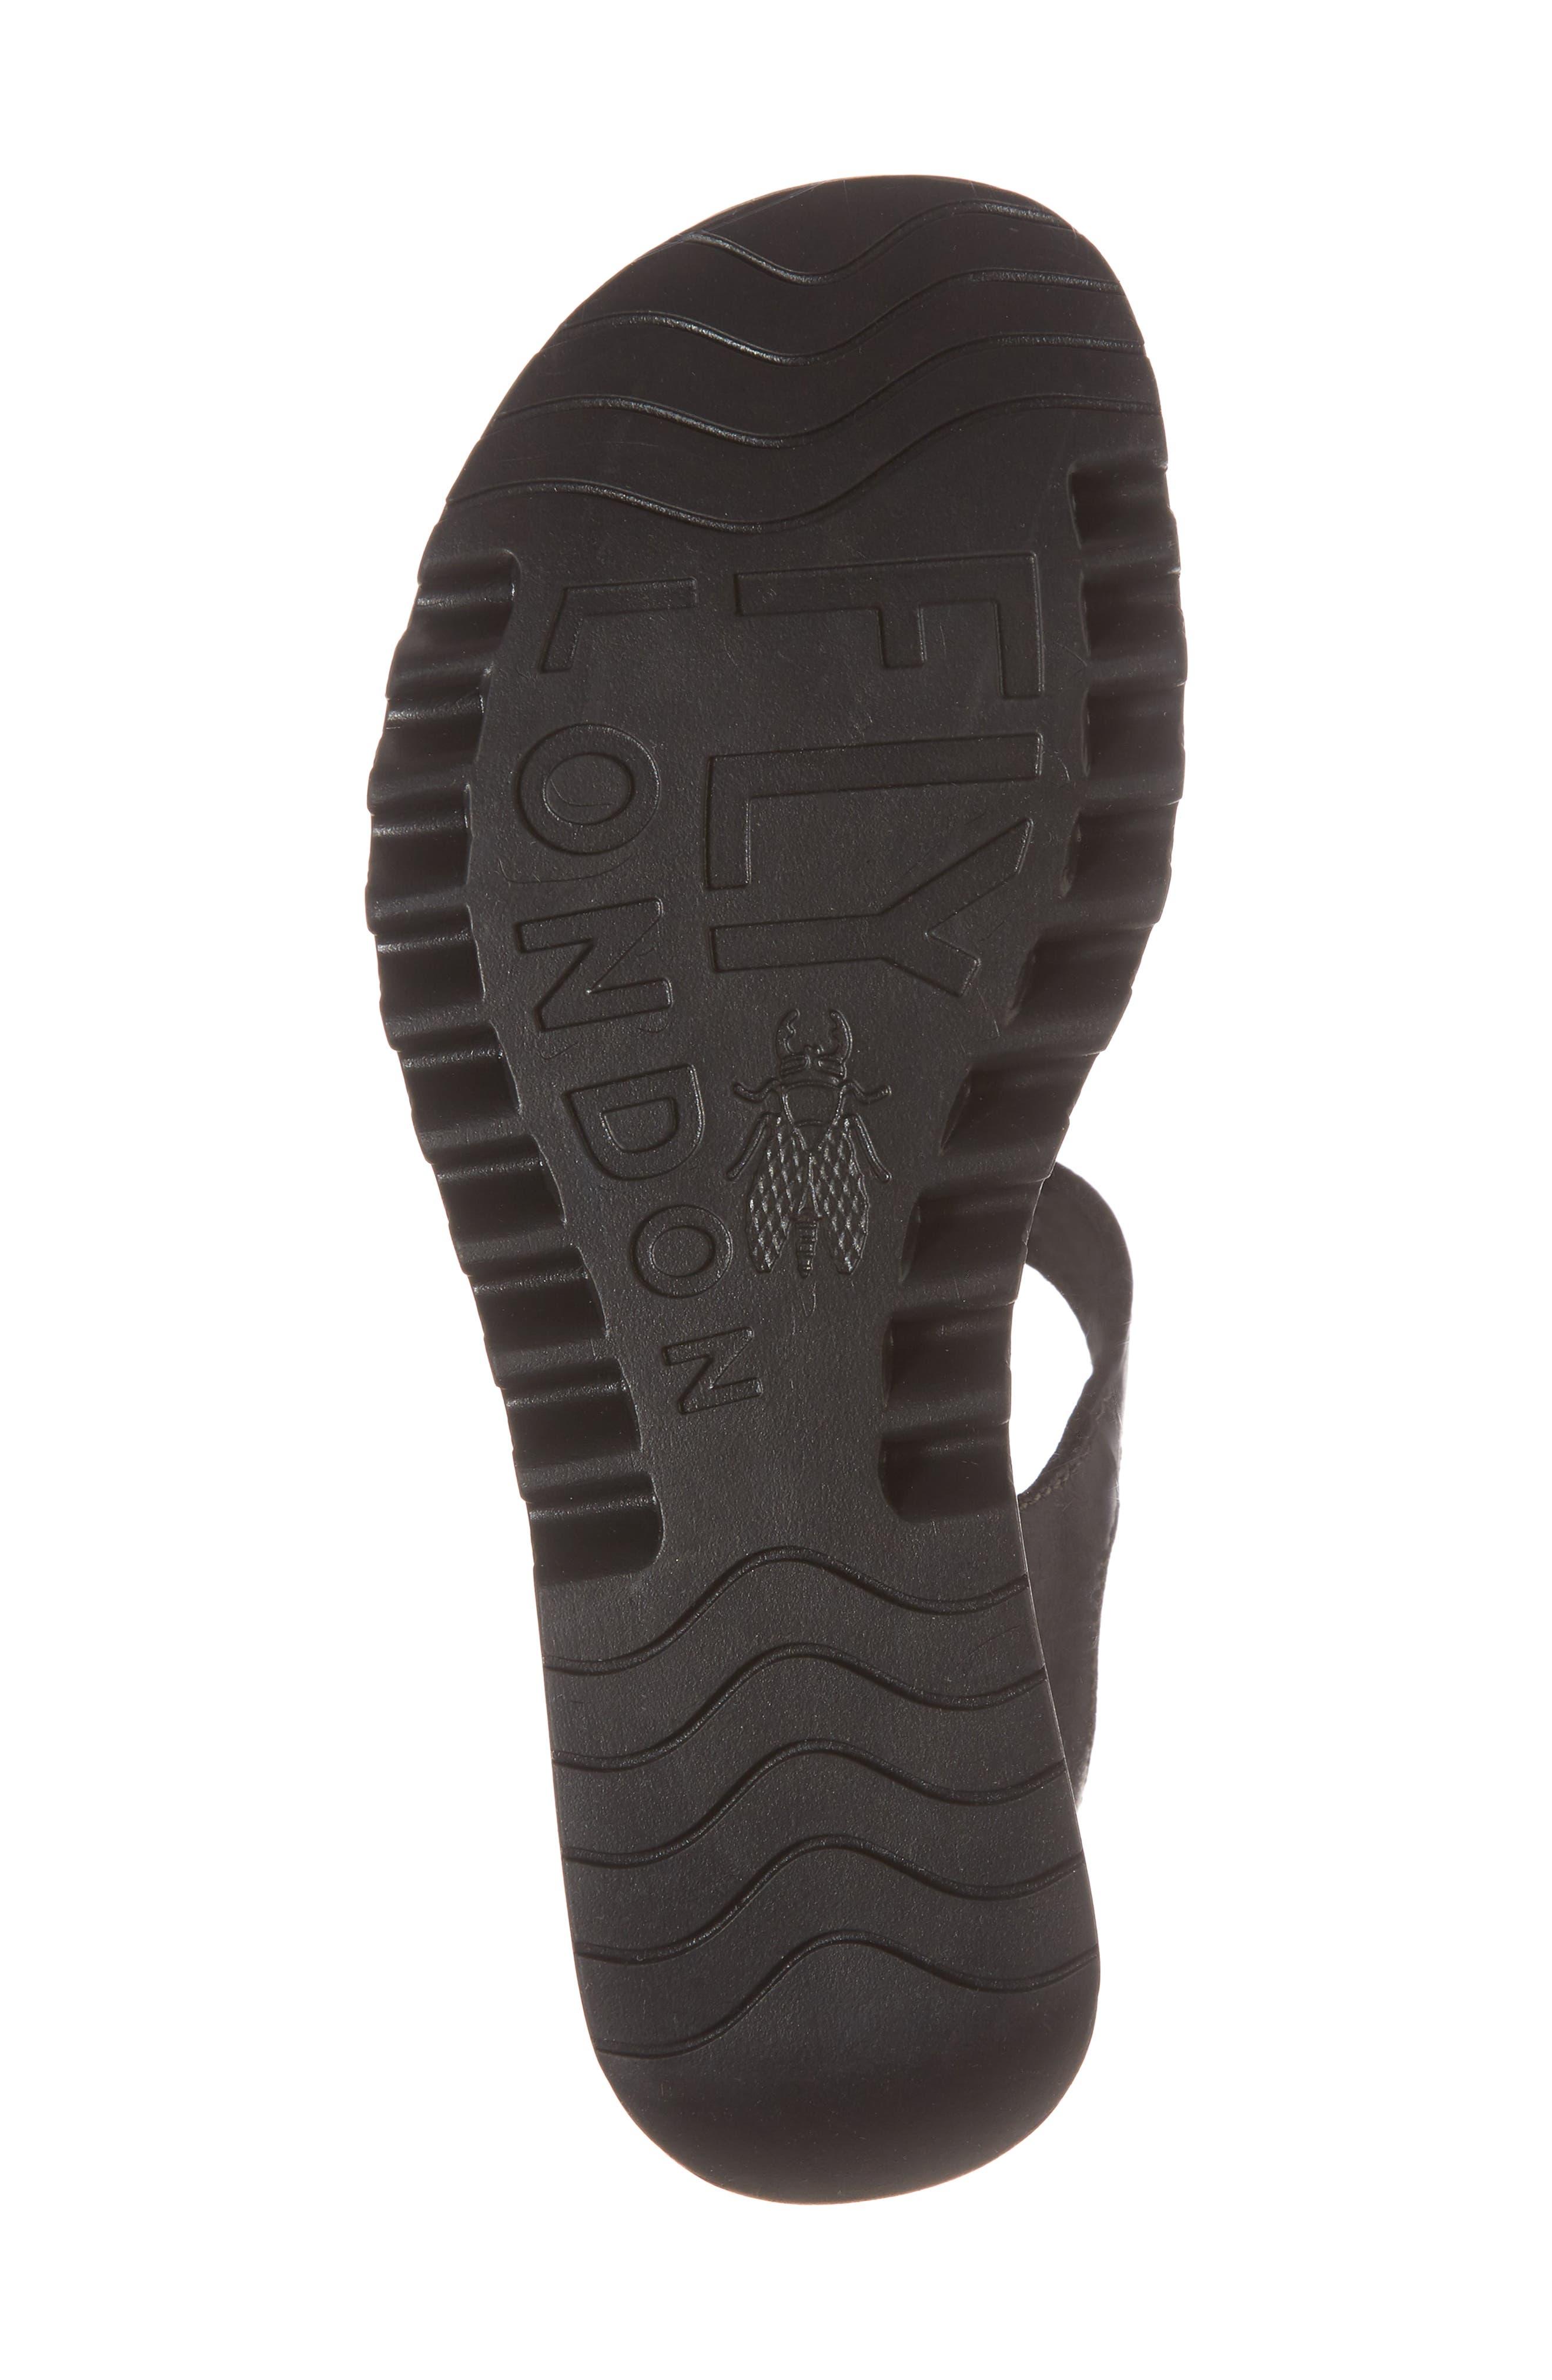 Egal Sandal,                             Alternate thumbnail 6, color,                             BLACK COLMAR LEATHER